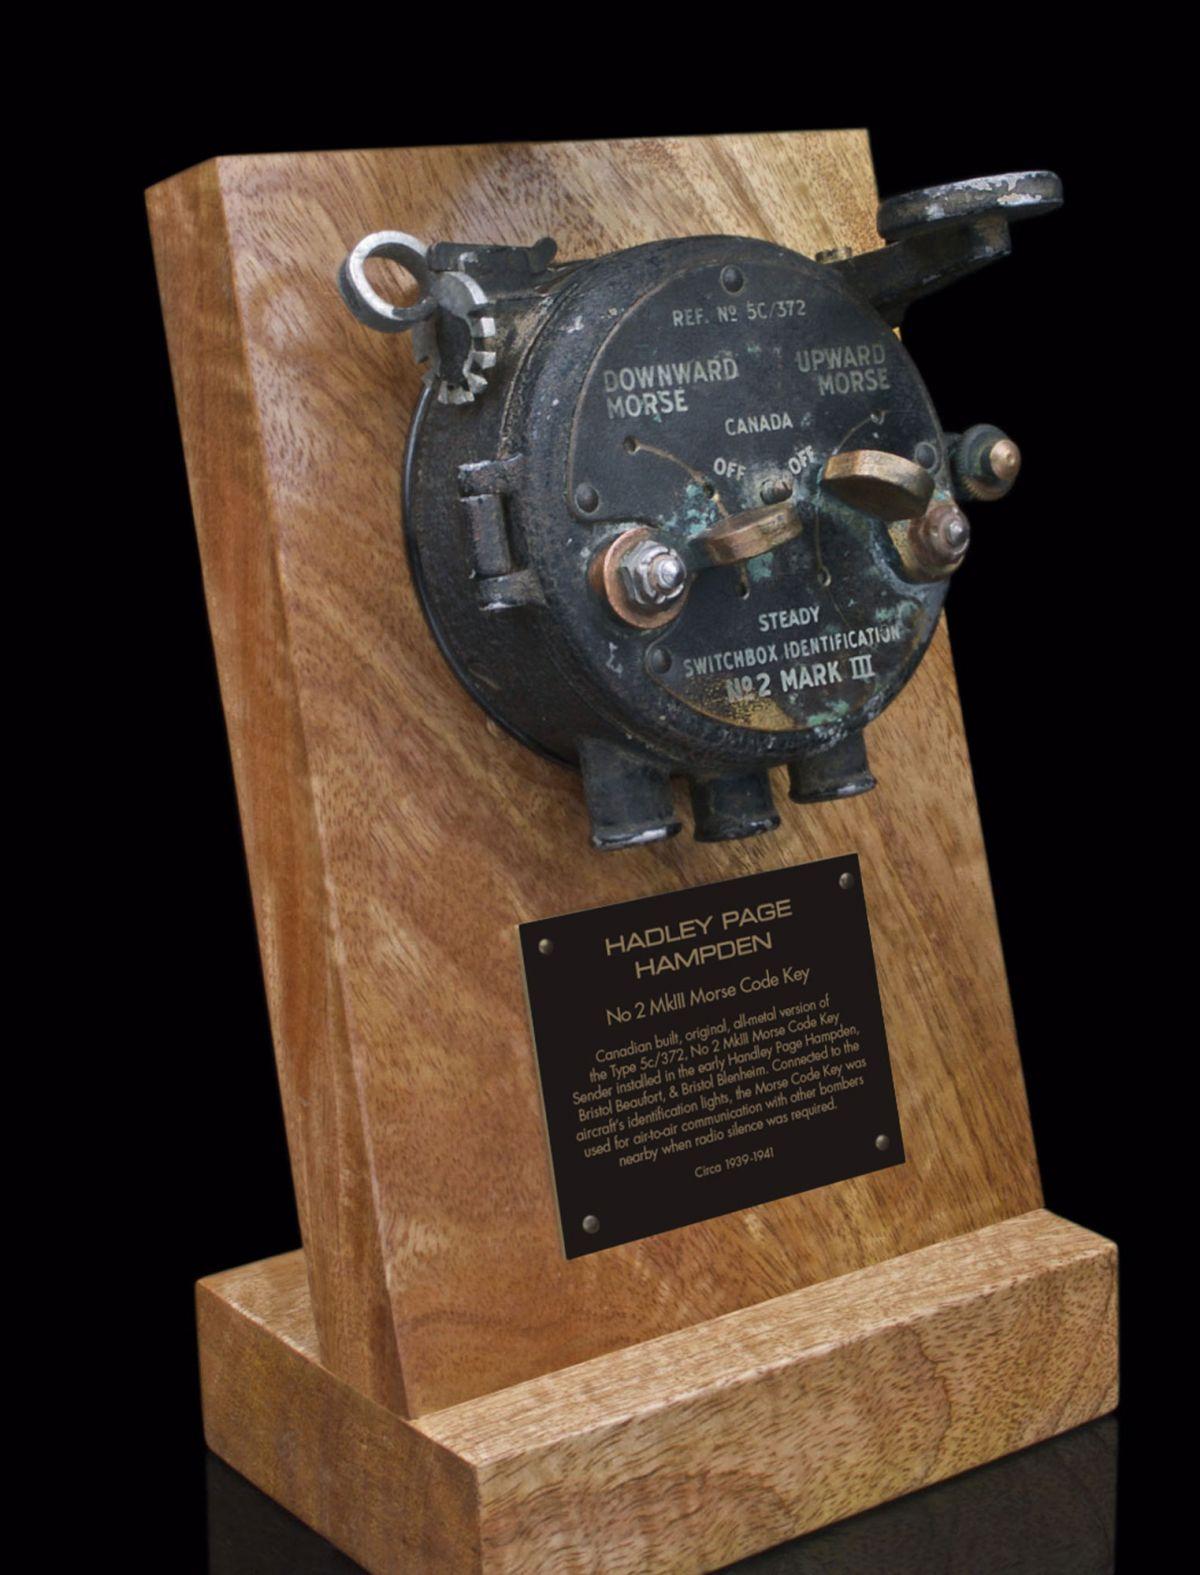 HANDLEY PAGE HAMPDEN Mk1A-V, 5c/372 No.2 Mk III MORSE CODE KEY